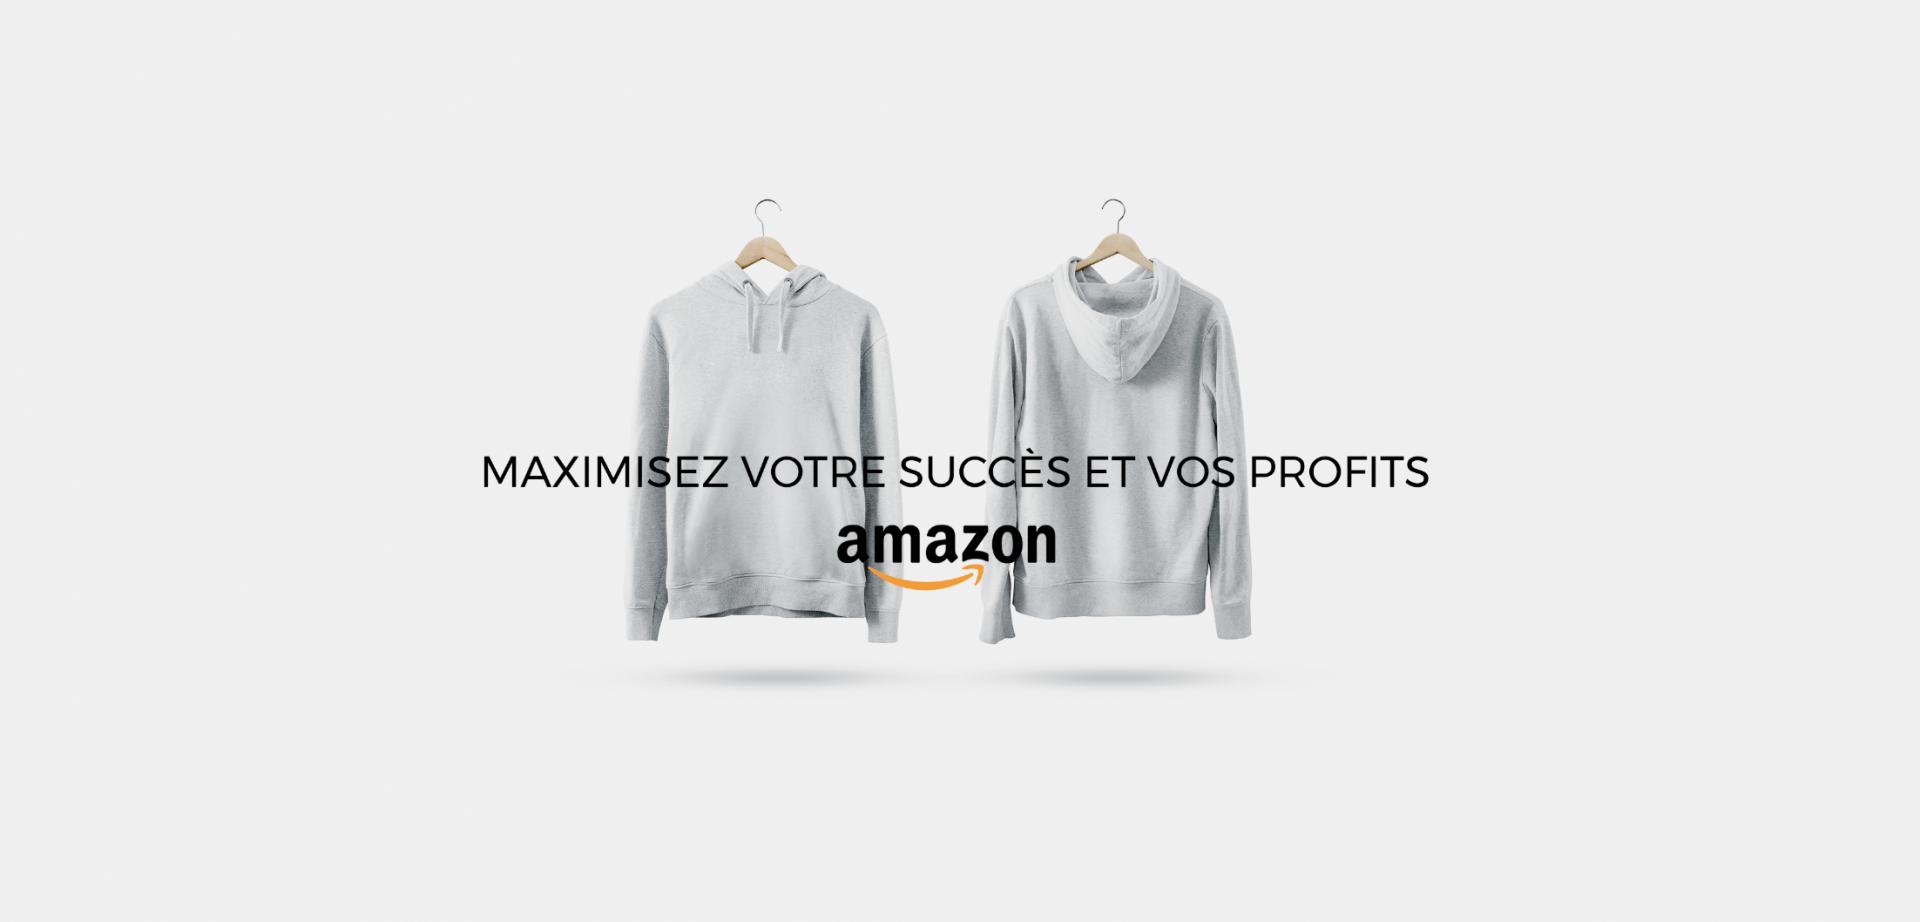 Amazon / Marketing / Fiscalité